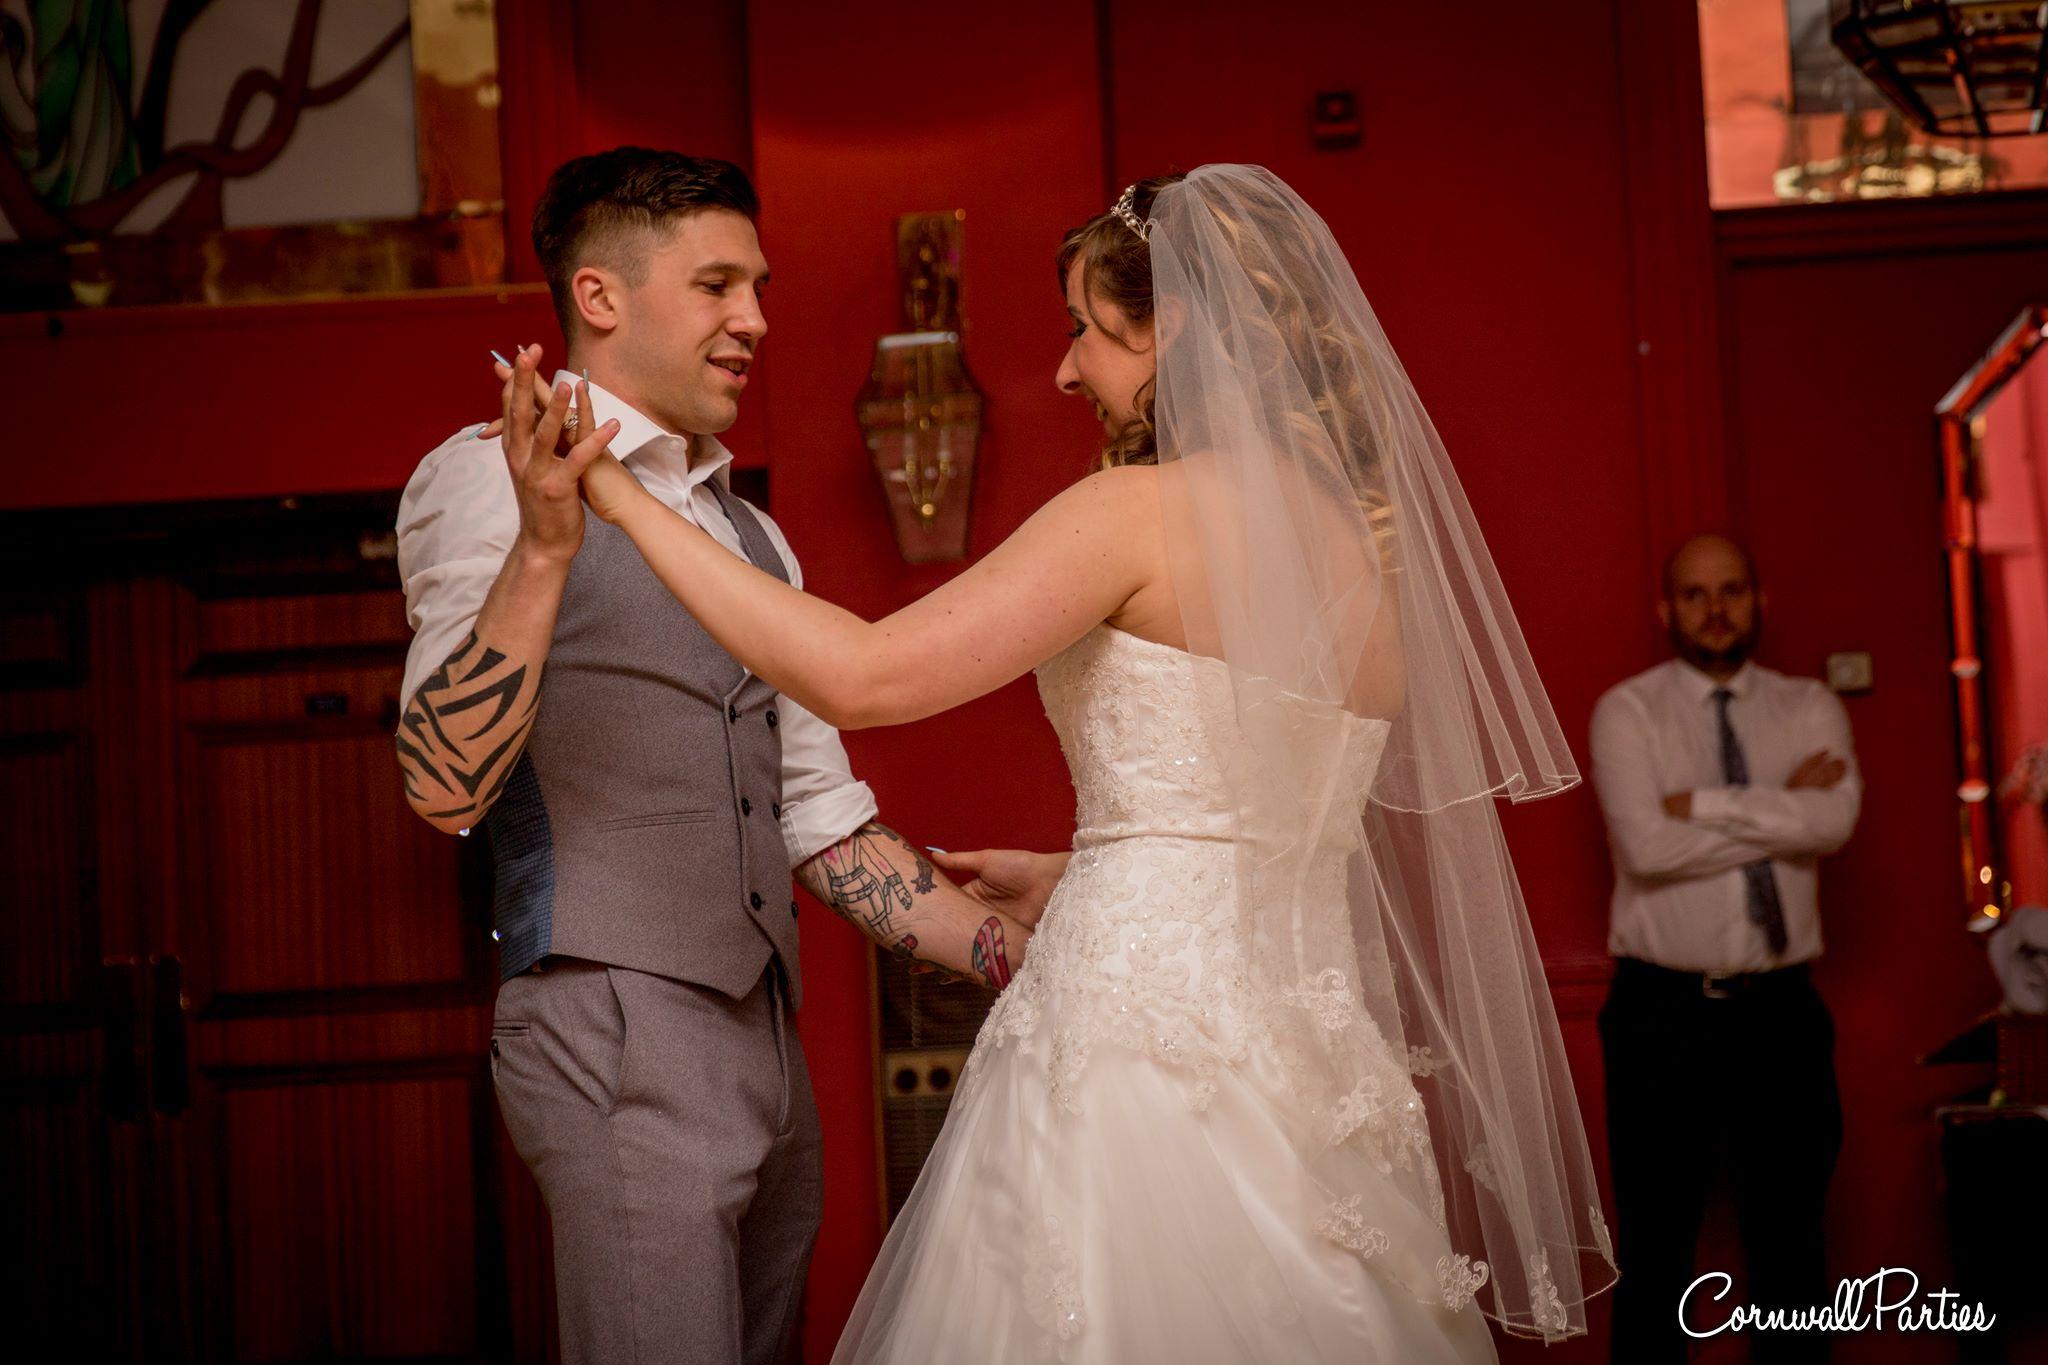 cornwall wedding disco dj photographer 25